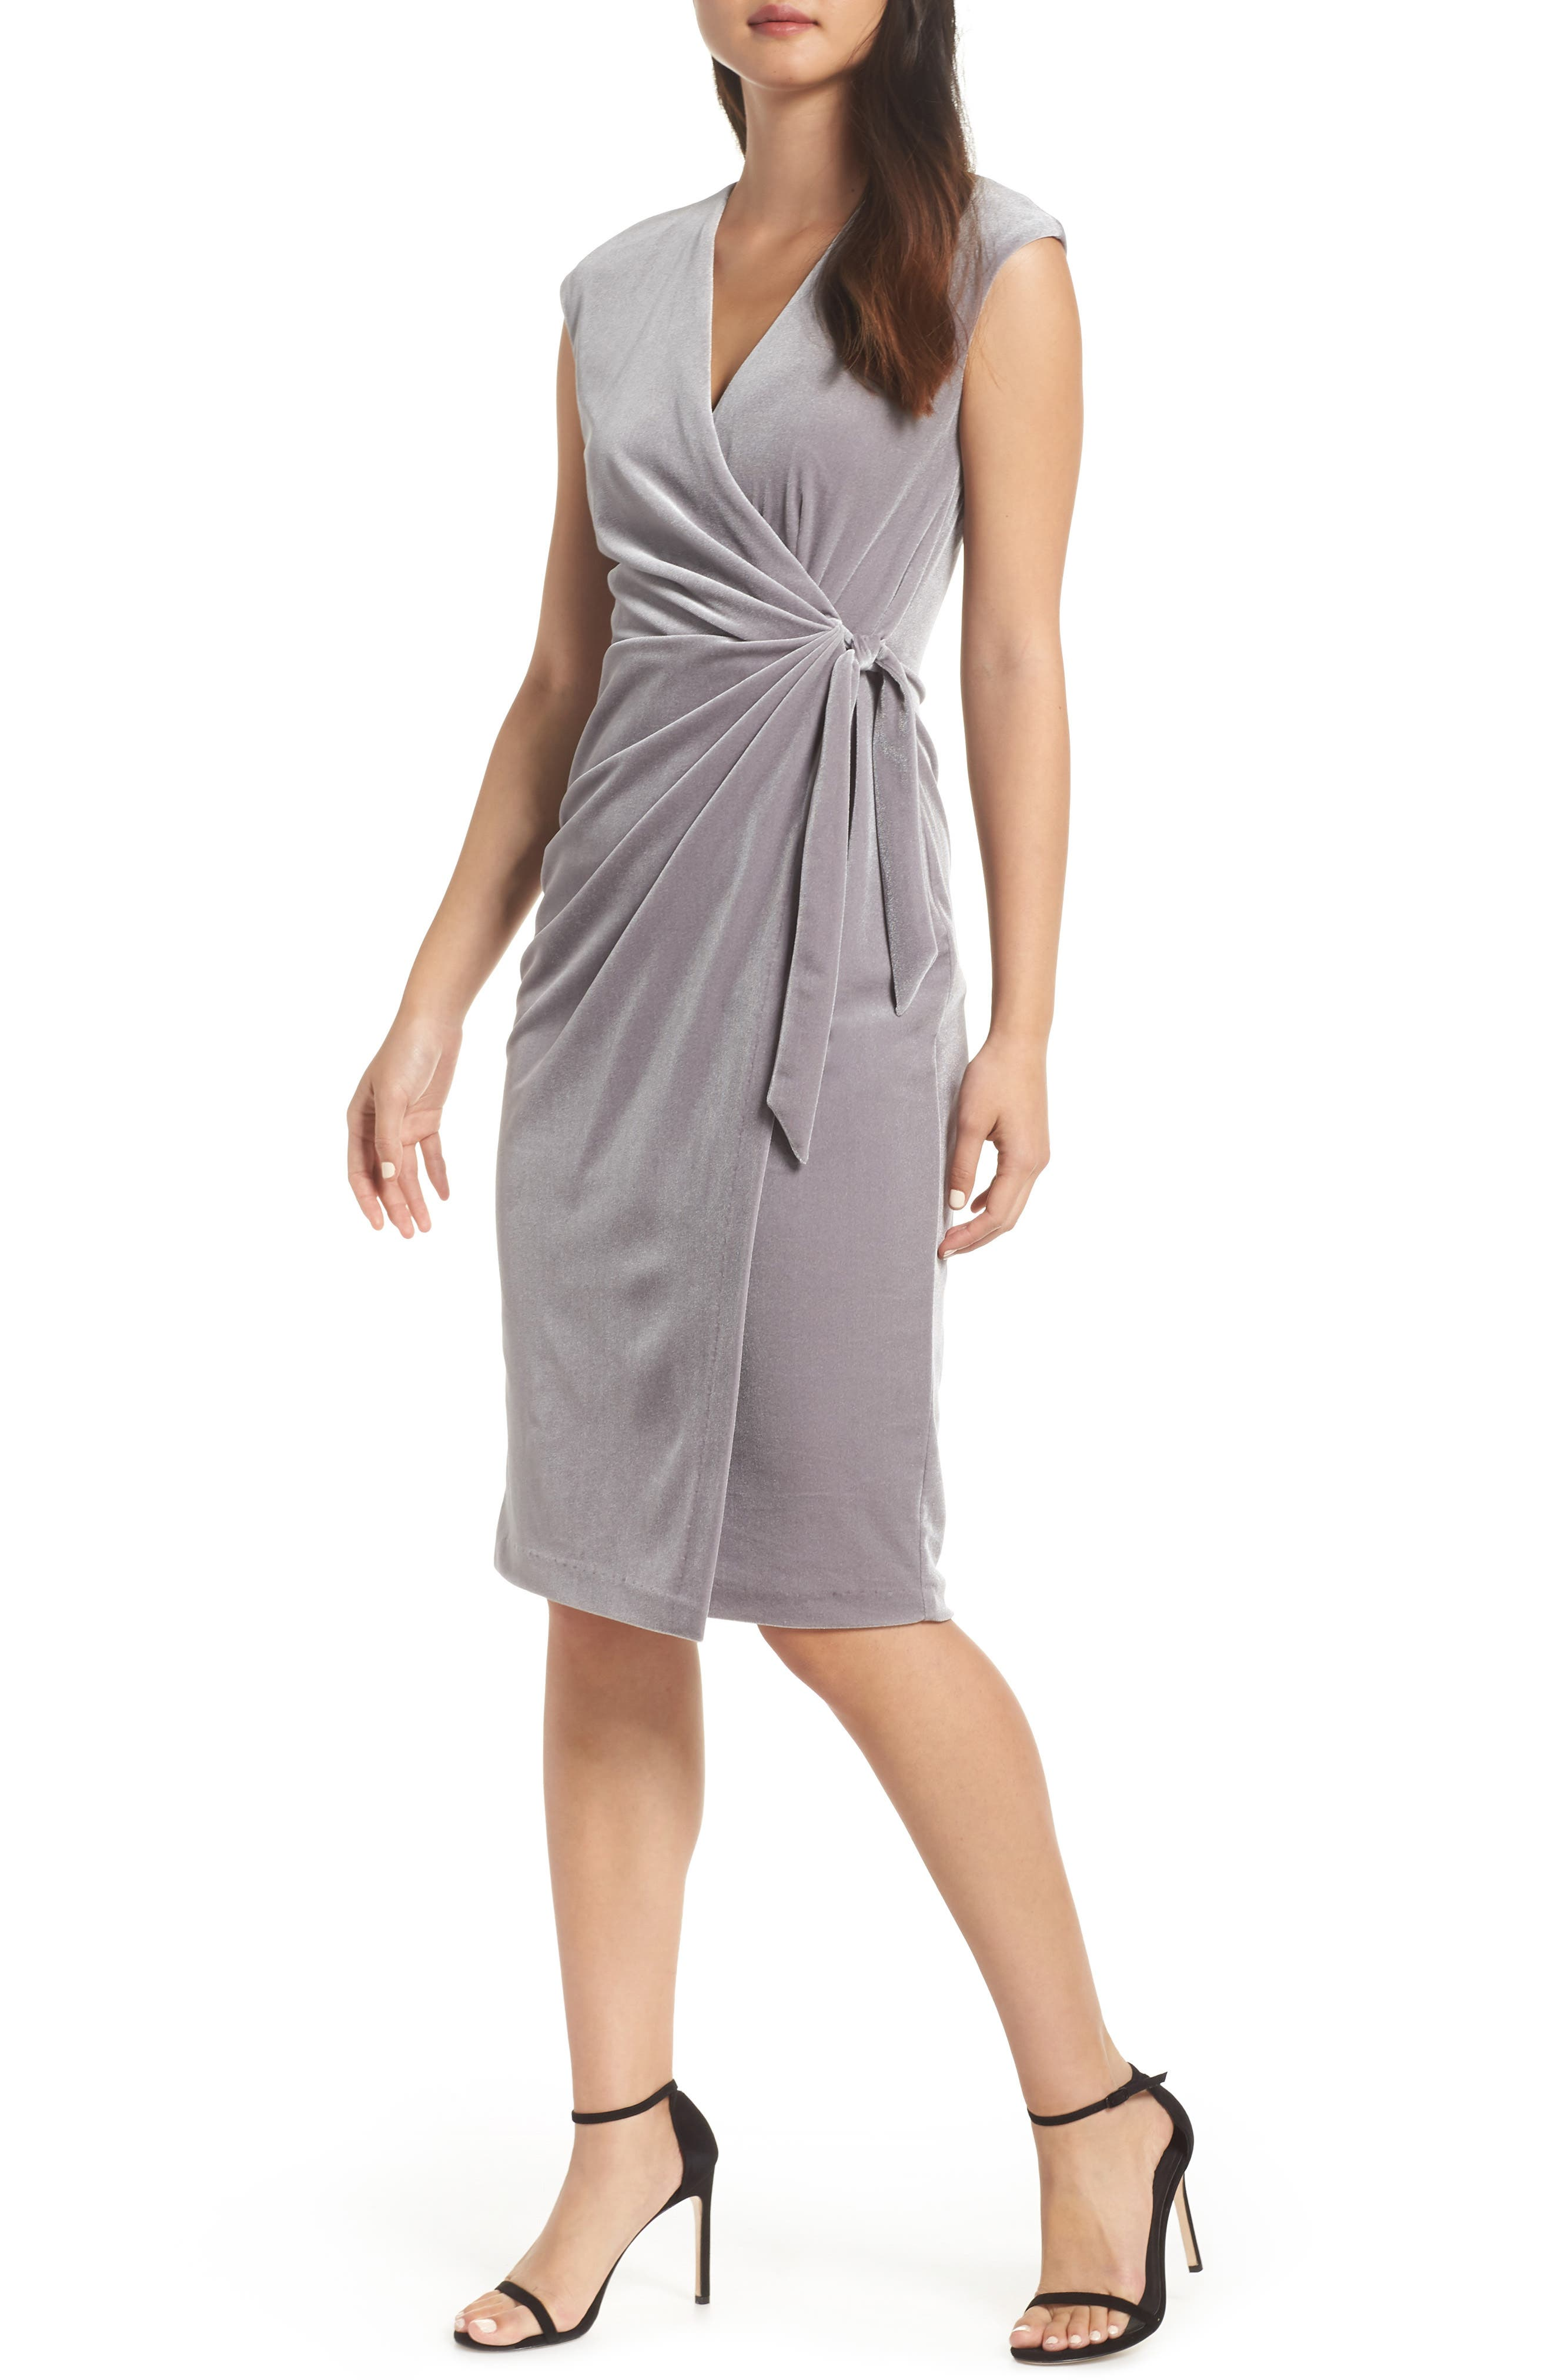 Vintage Cocktail Dresses, Party Dresses, Prom Dresses Womens Maggy London Velvet Faux Wrap Dress Size 18 similar to 16W - Metallic $138.00 AT vintagedancer.com